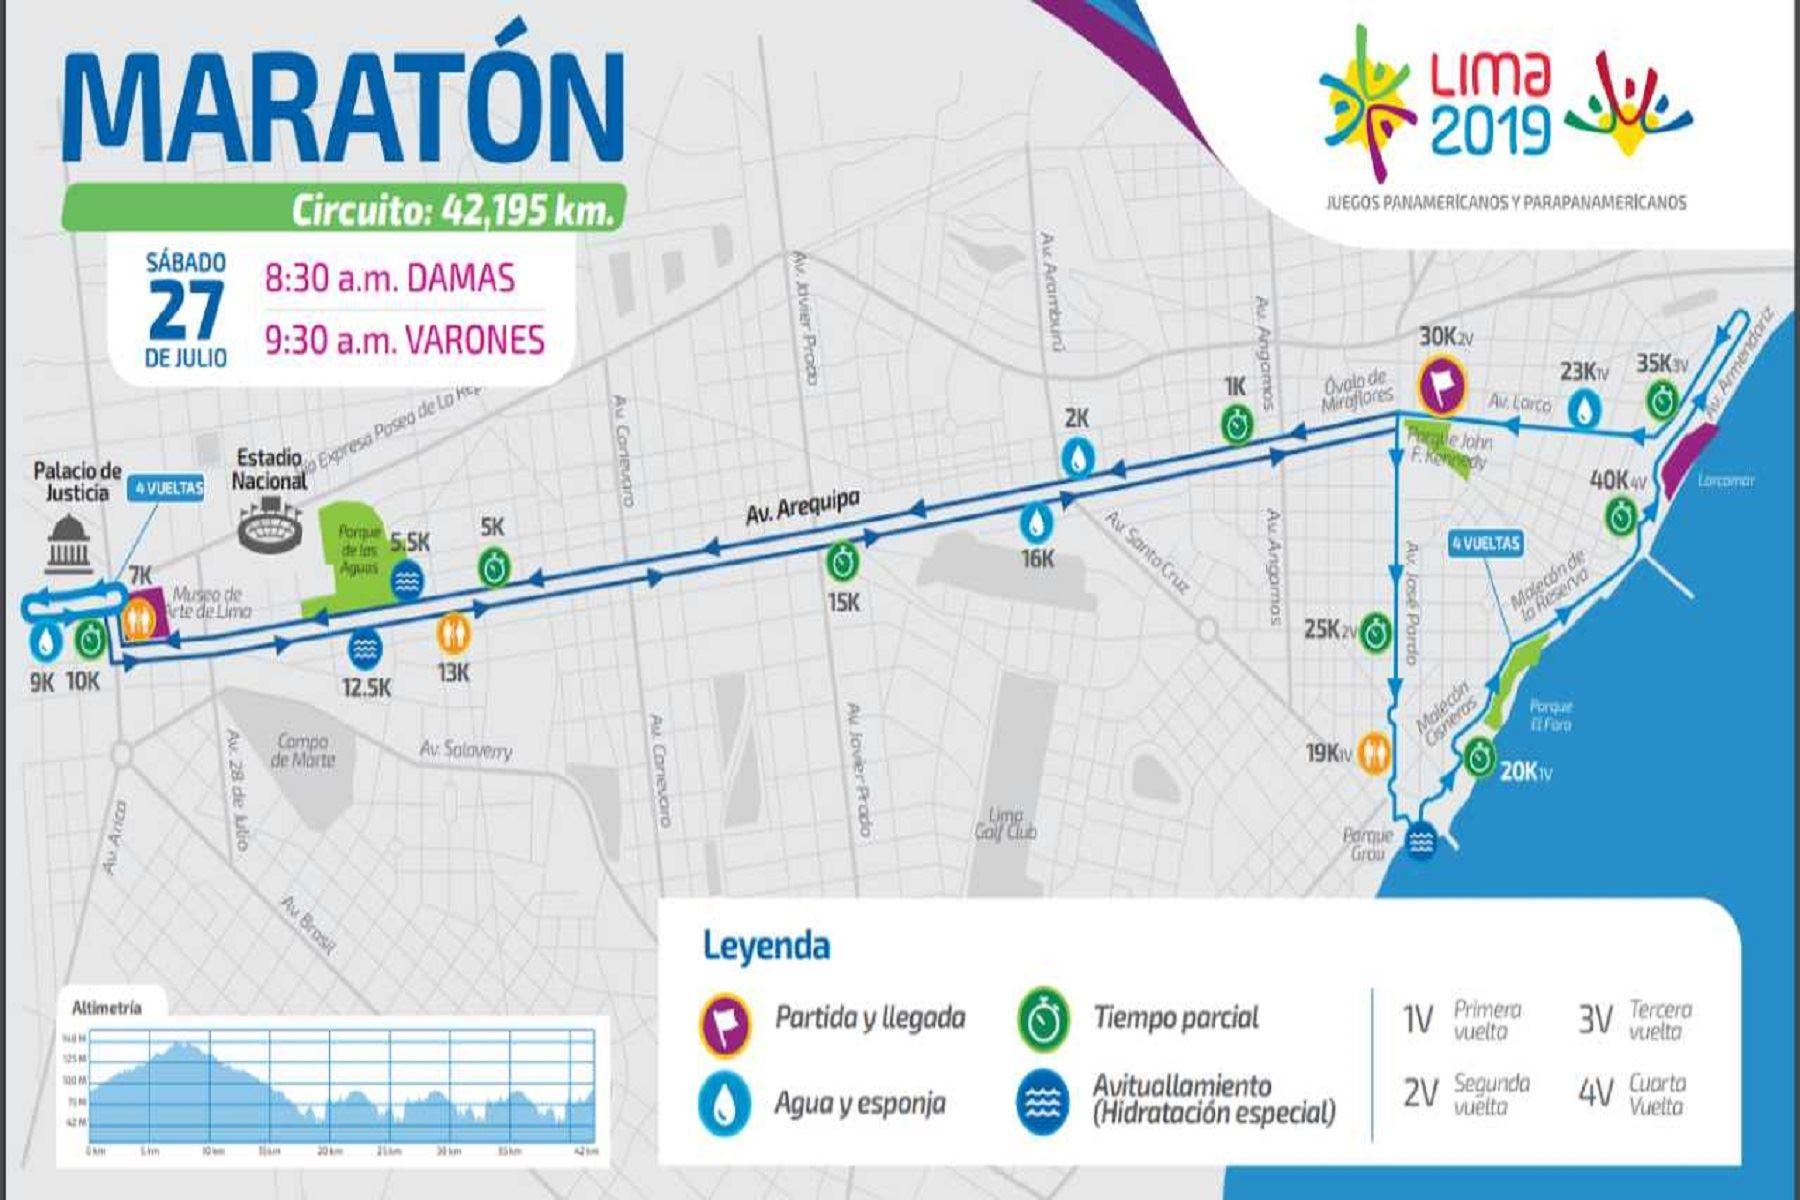 Maratón Lima 2019 Foto: Lima 2019